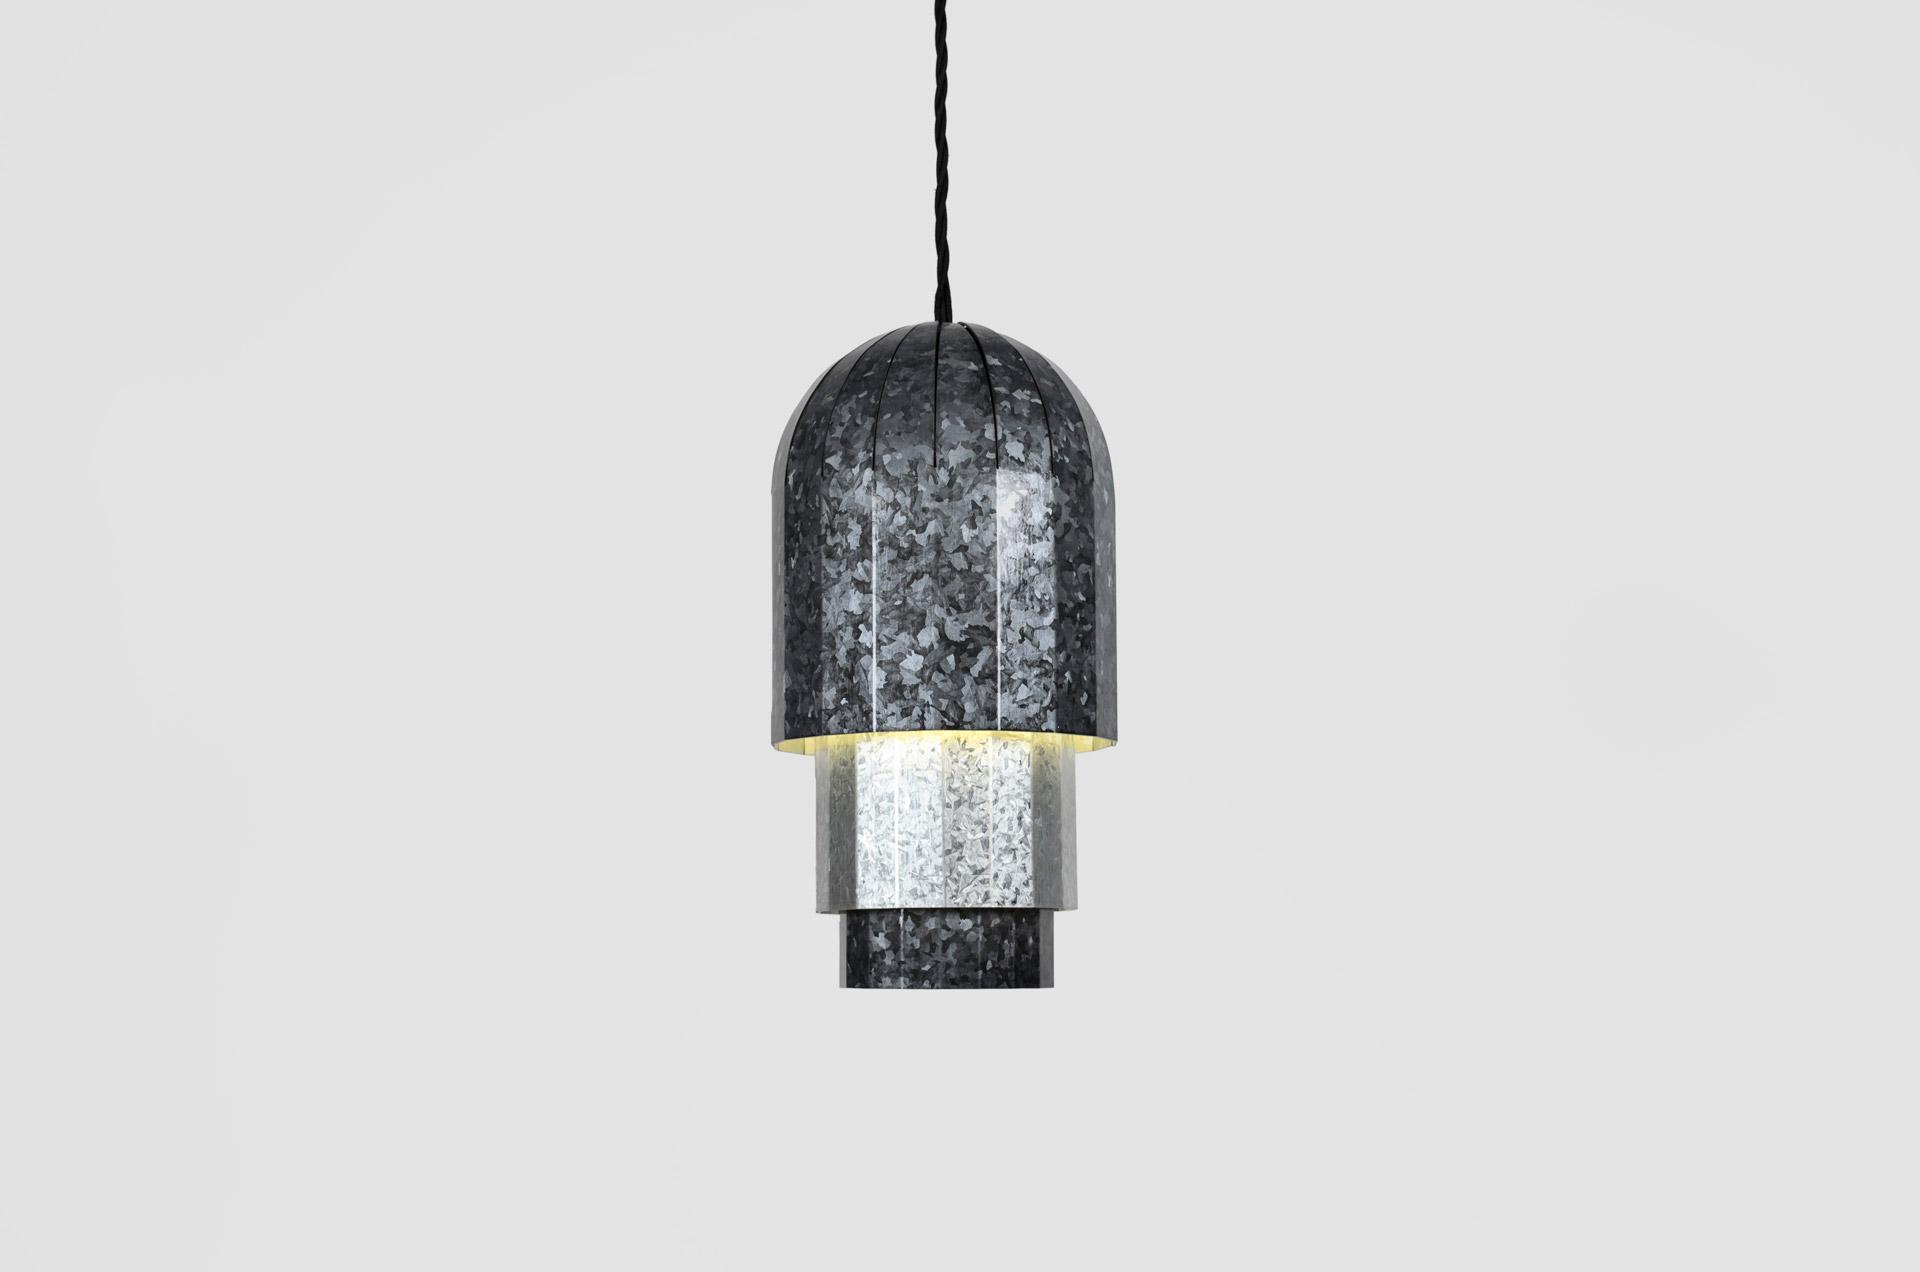 Tino Seubert - Regalvanize - Pendant Light